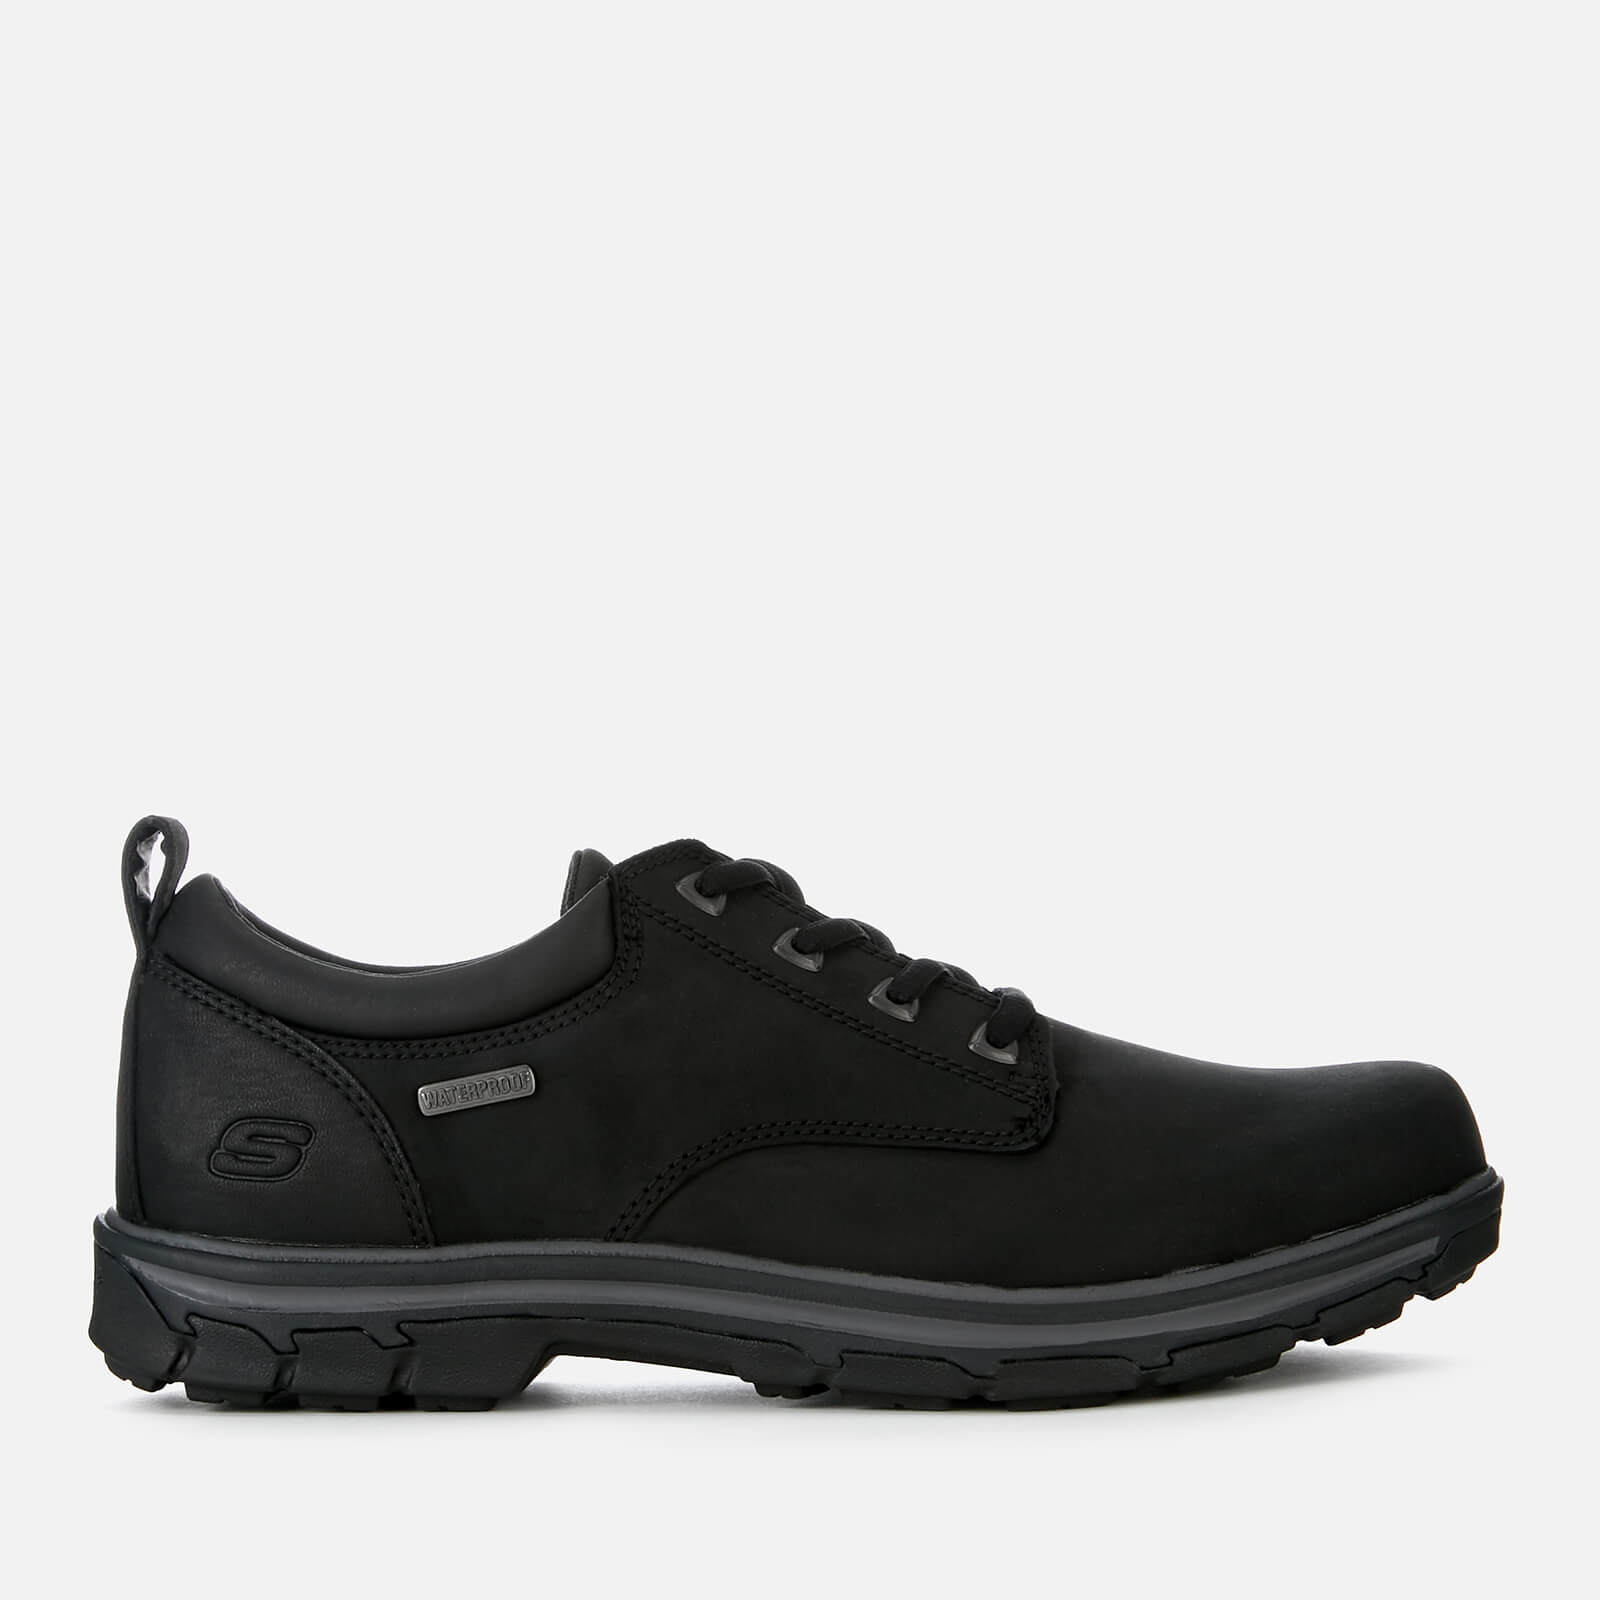 Negro Zapatos Skechers Segment Bertan Hombre 0OPN8wnkX